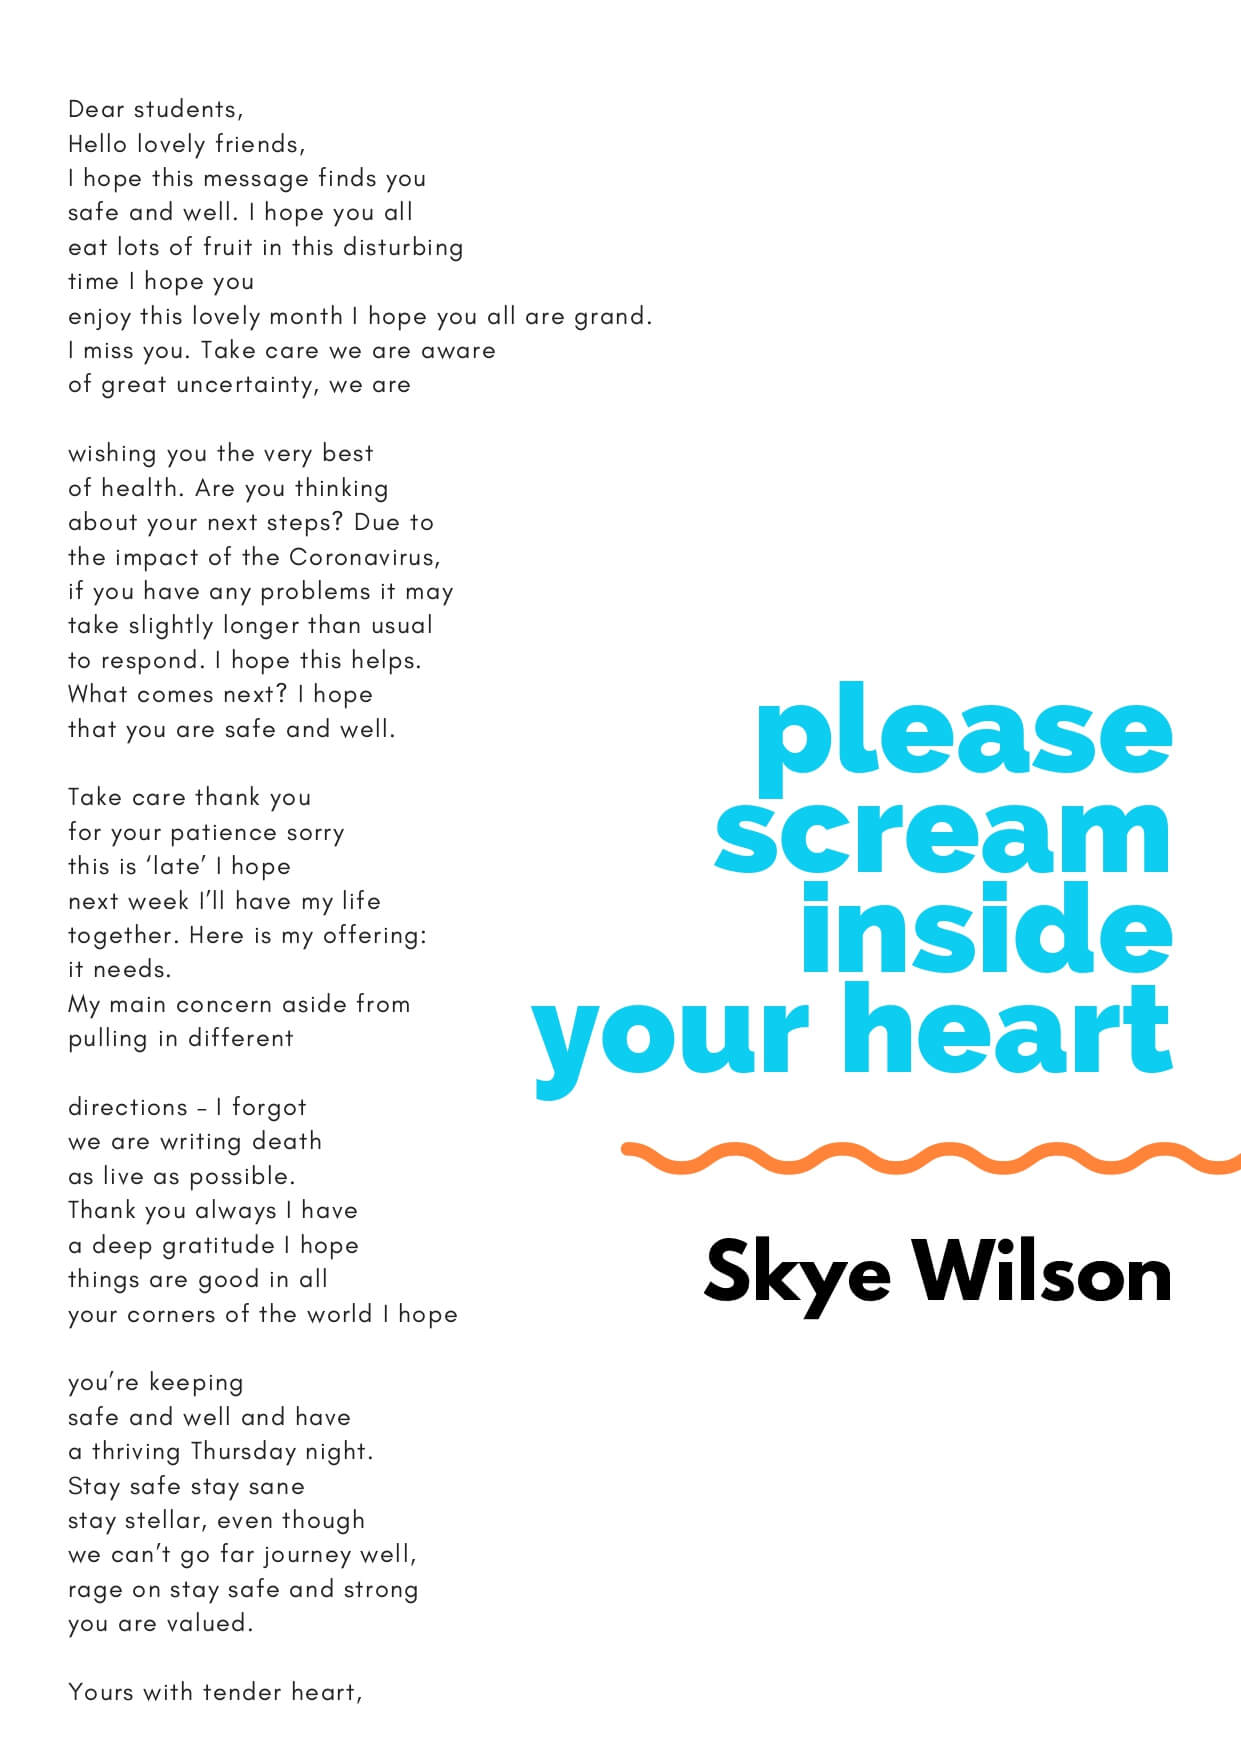 How to Change the World zine - Please Scream Inside Your Hear by Skye Wilson